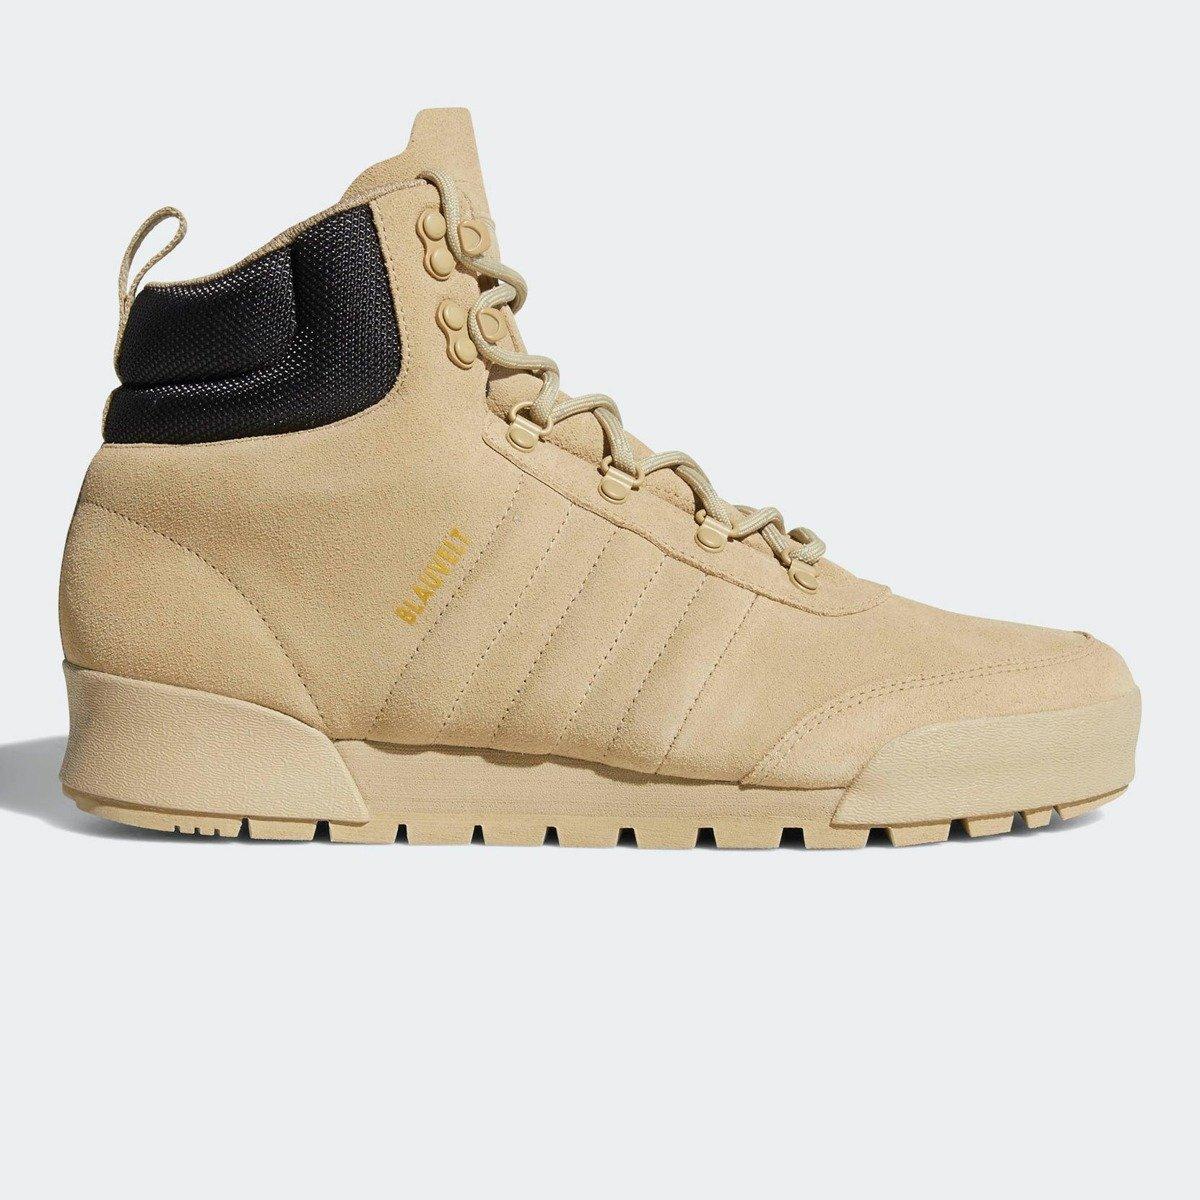 buy online f2c52 ee4ea Miniramp Skateshop buty adidas jake boot 2.0